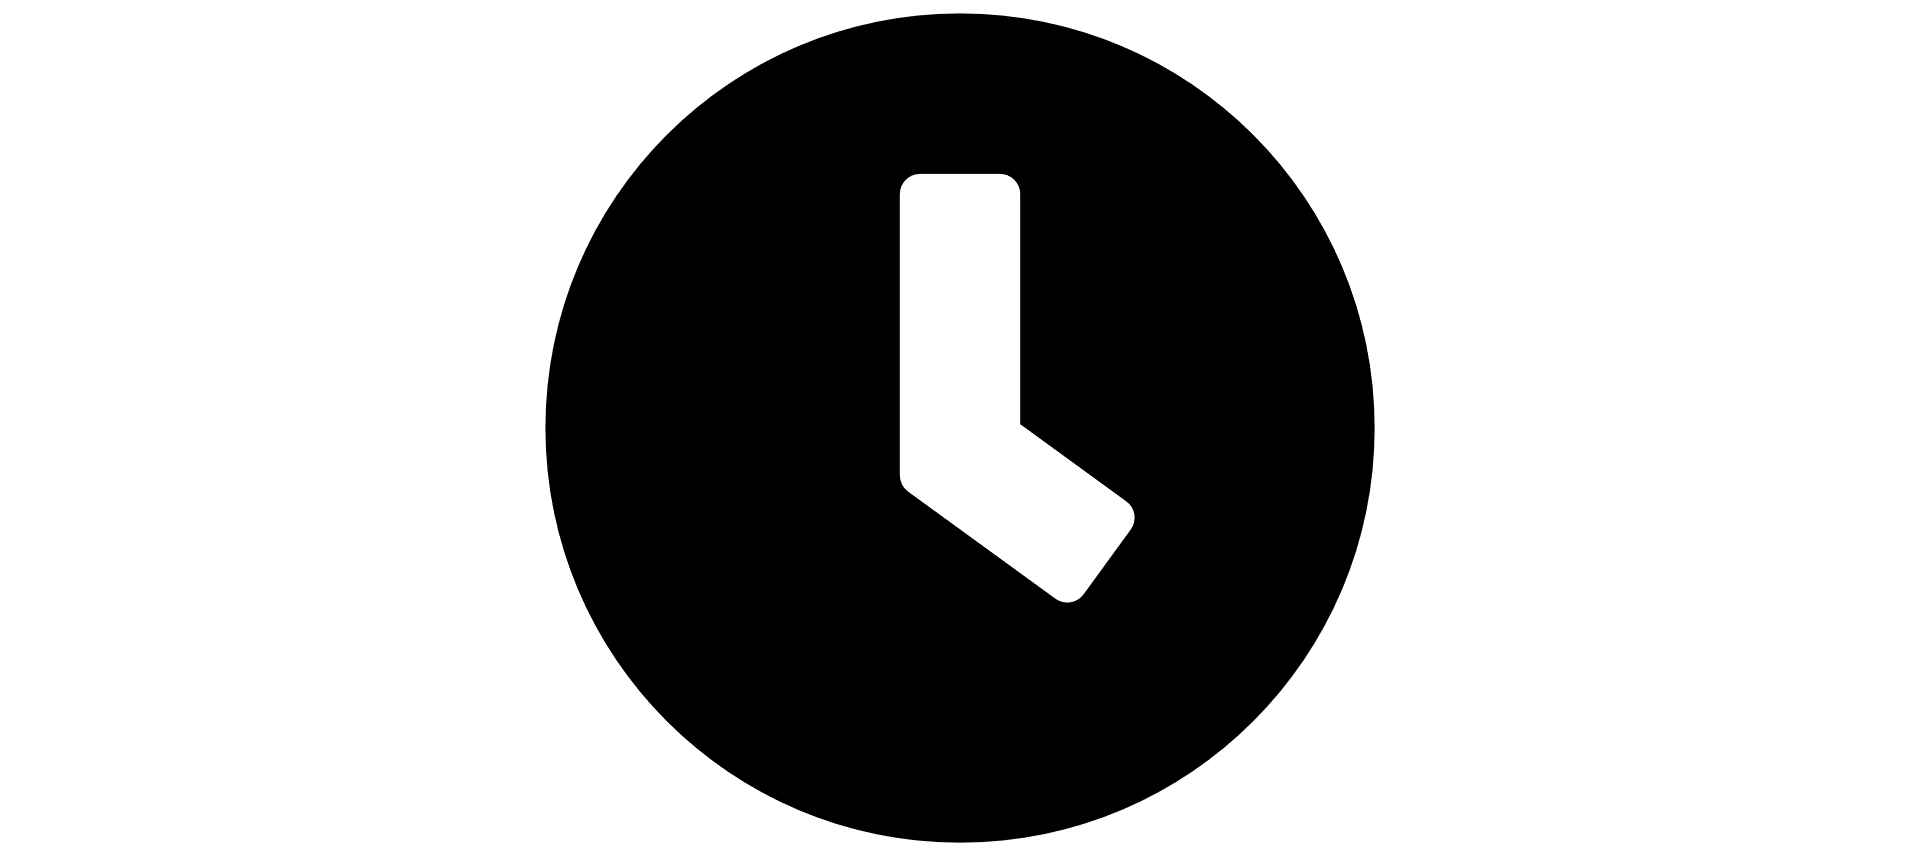 9a15e65b 6565 4c0a 8467 59252f18967b